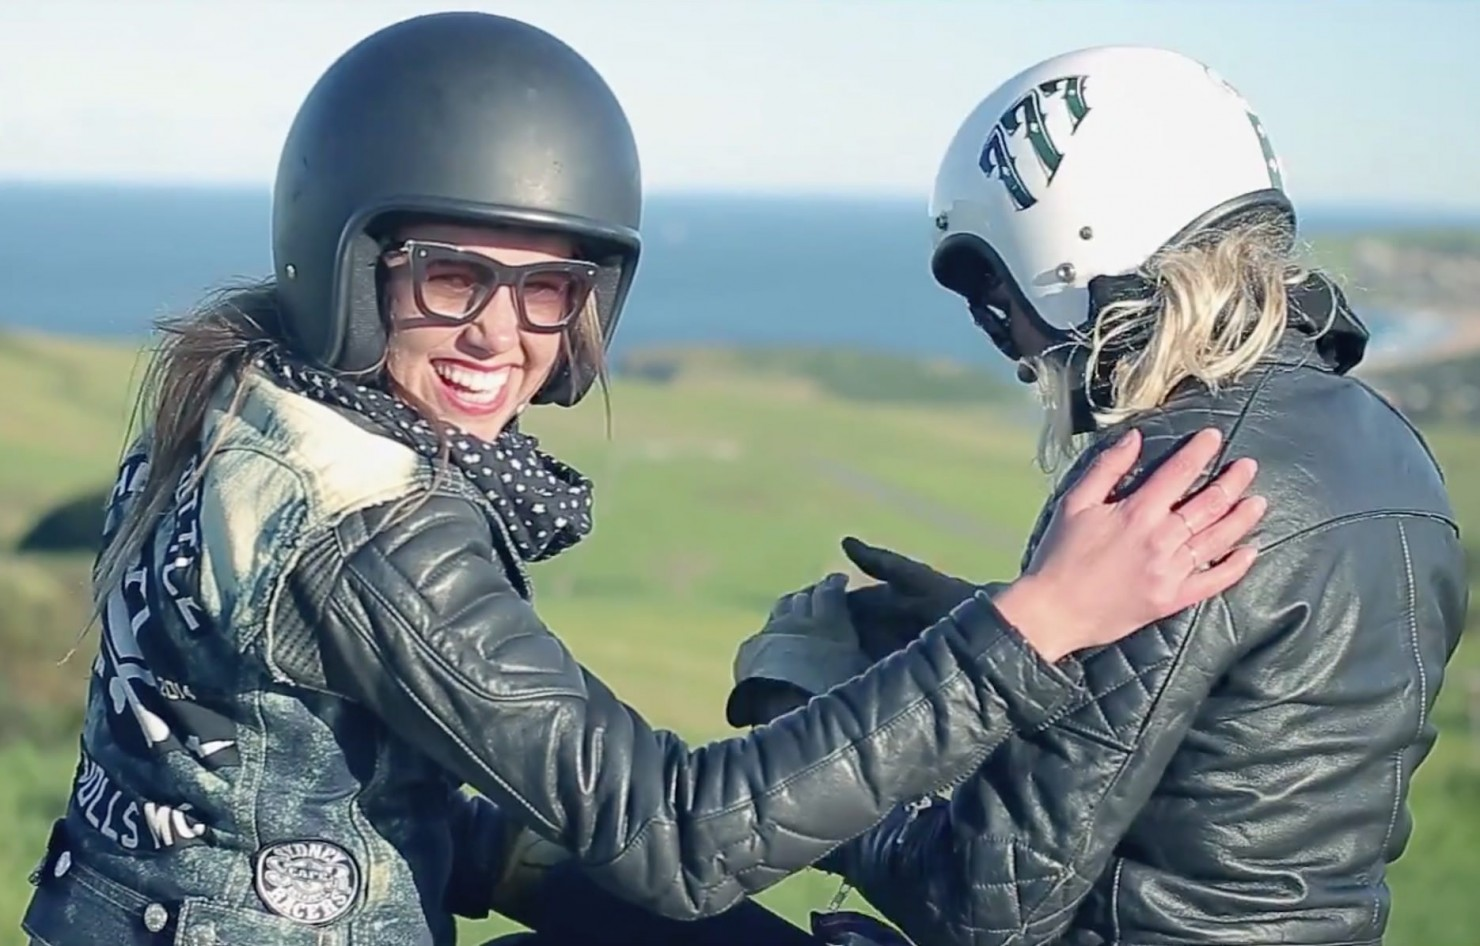 Girls Riding Motorcycles 3